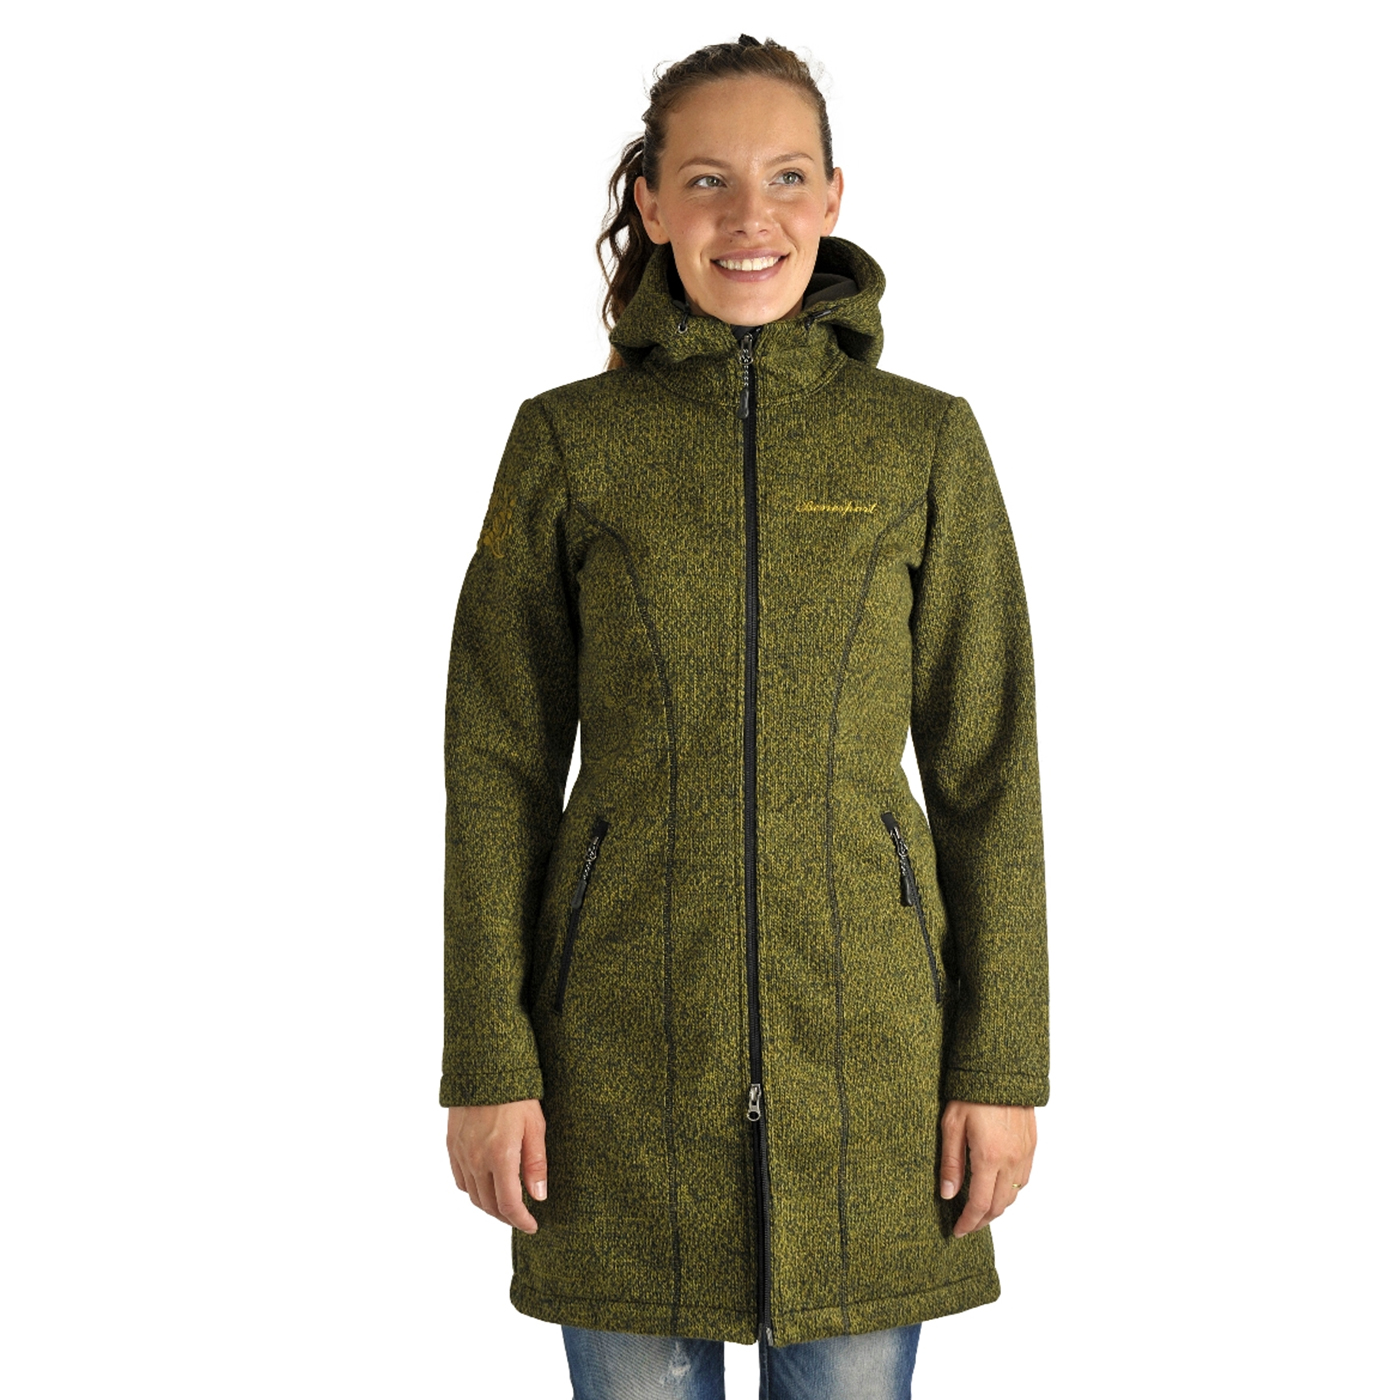 Benesport dámska bunda Pekelník - zelená, veľkosť S